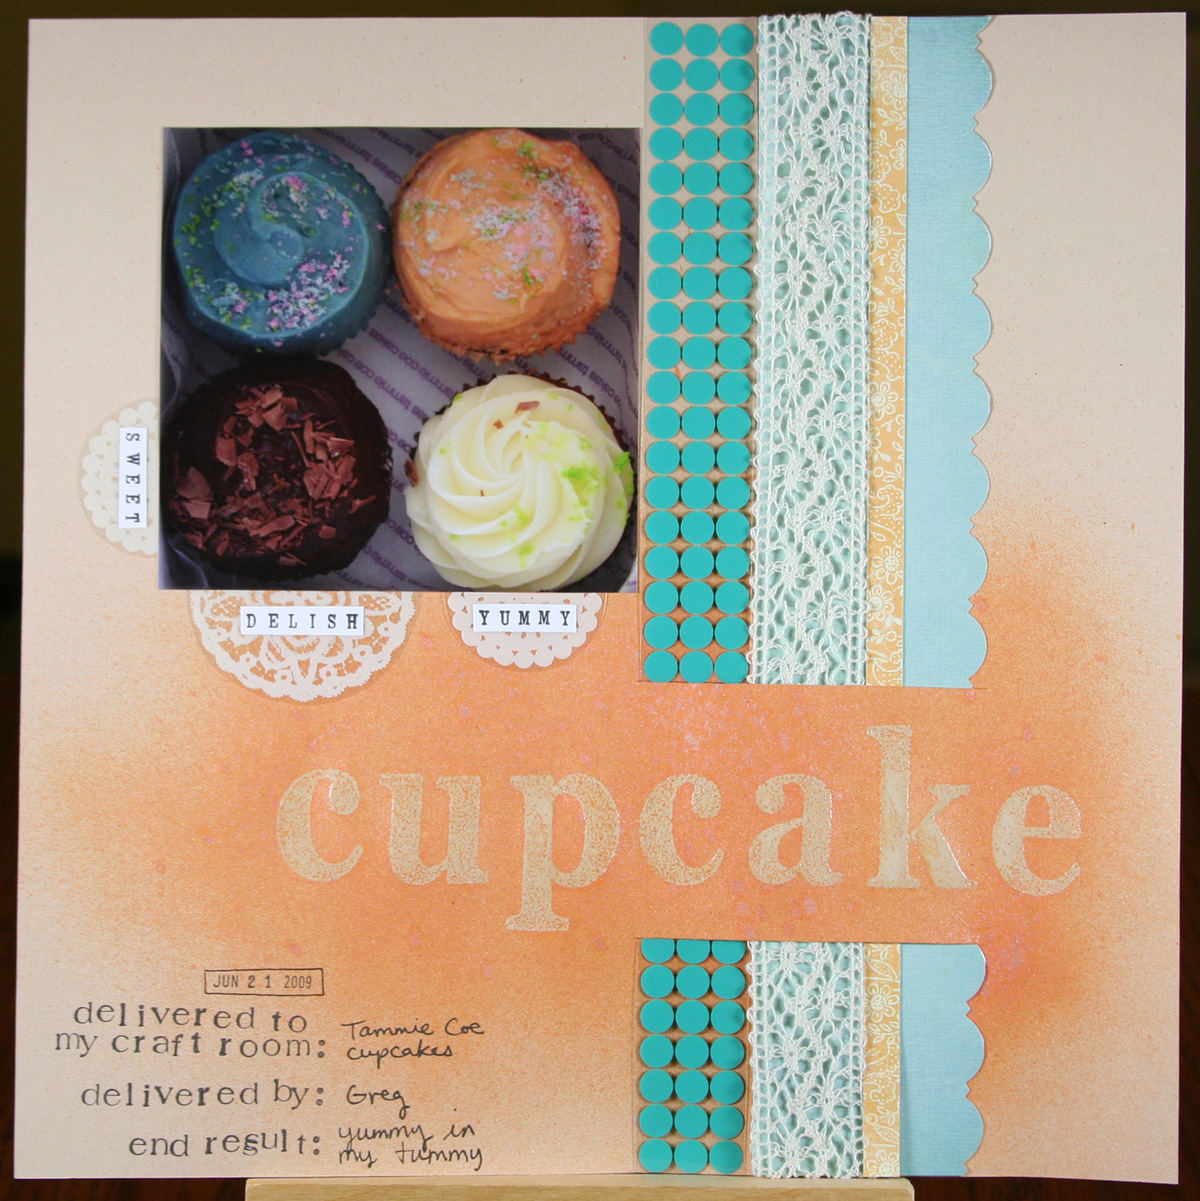 IMG_2827_CupcakeLayout